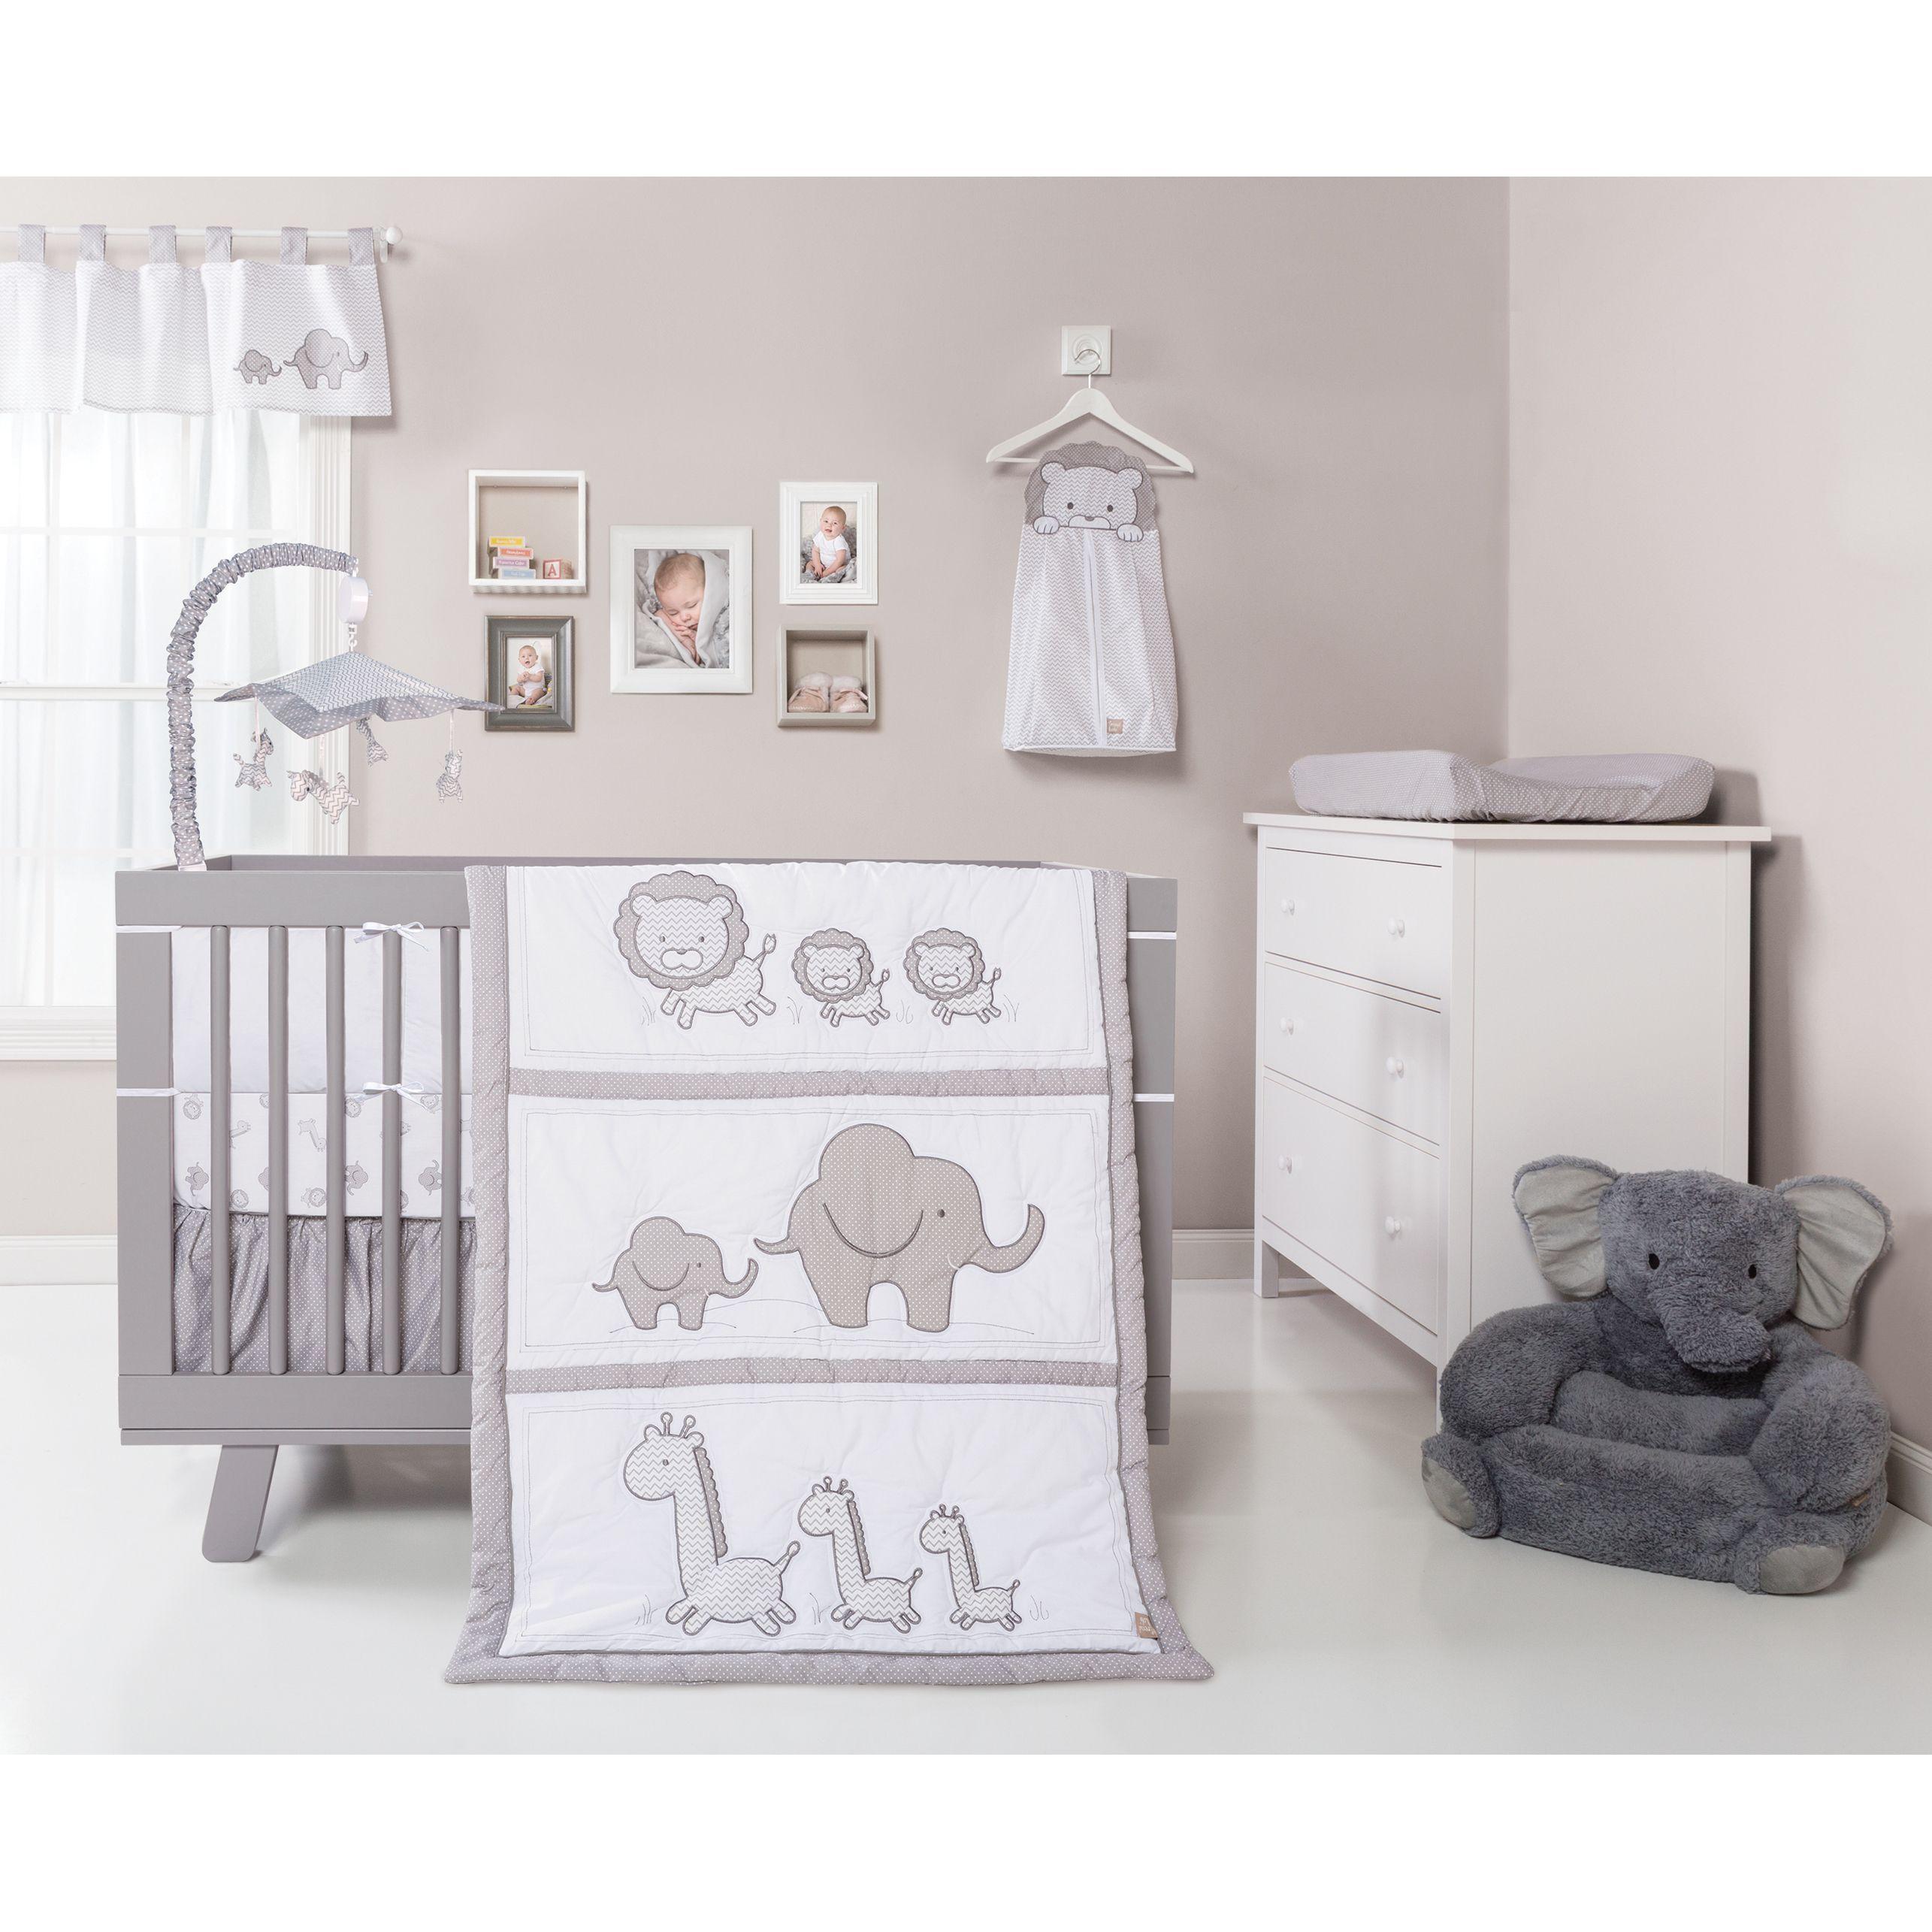 bed complete pelham com essentials bath park overstock comforter madison bedding and sheet aqua cotton set yellow product bay